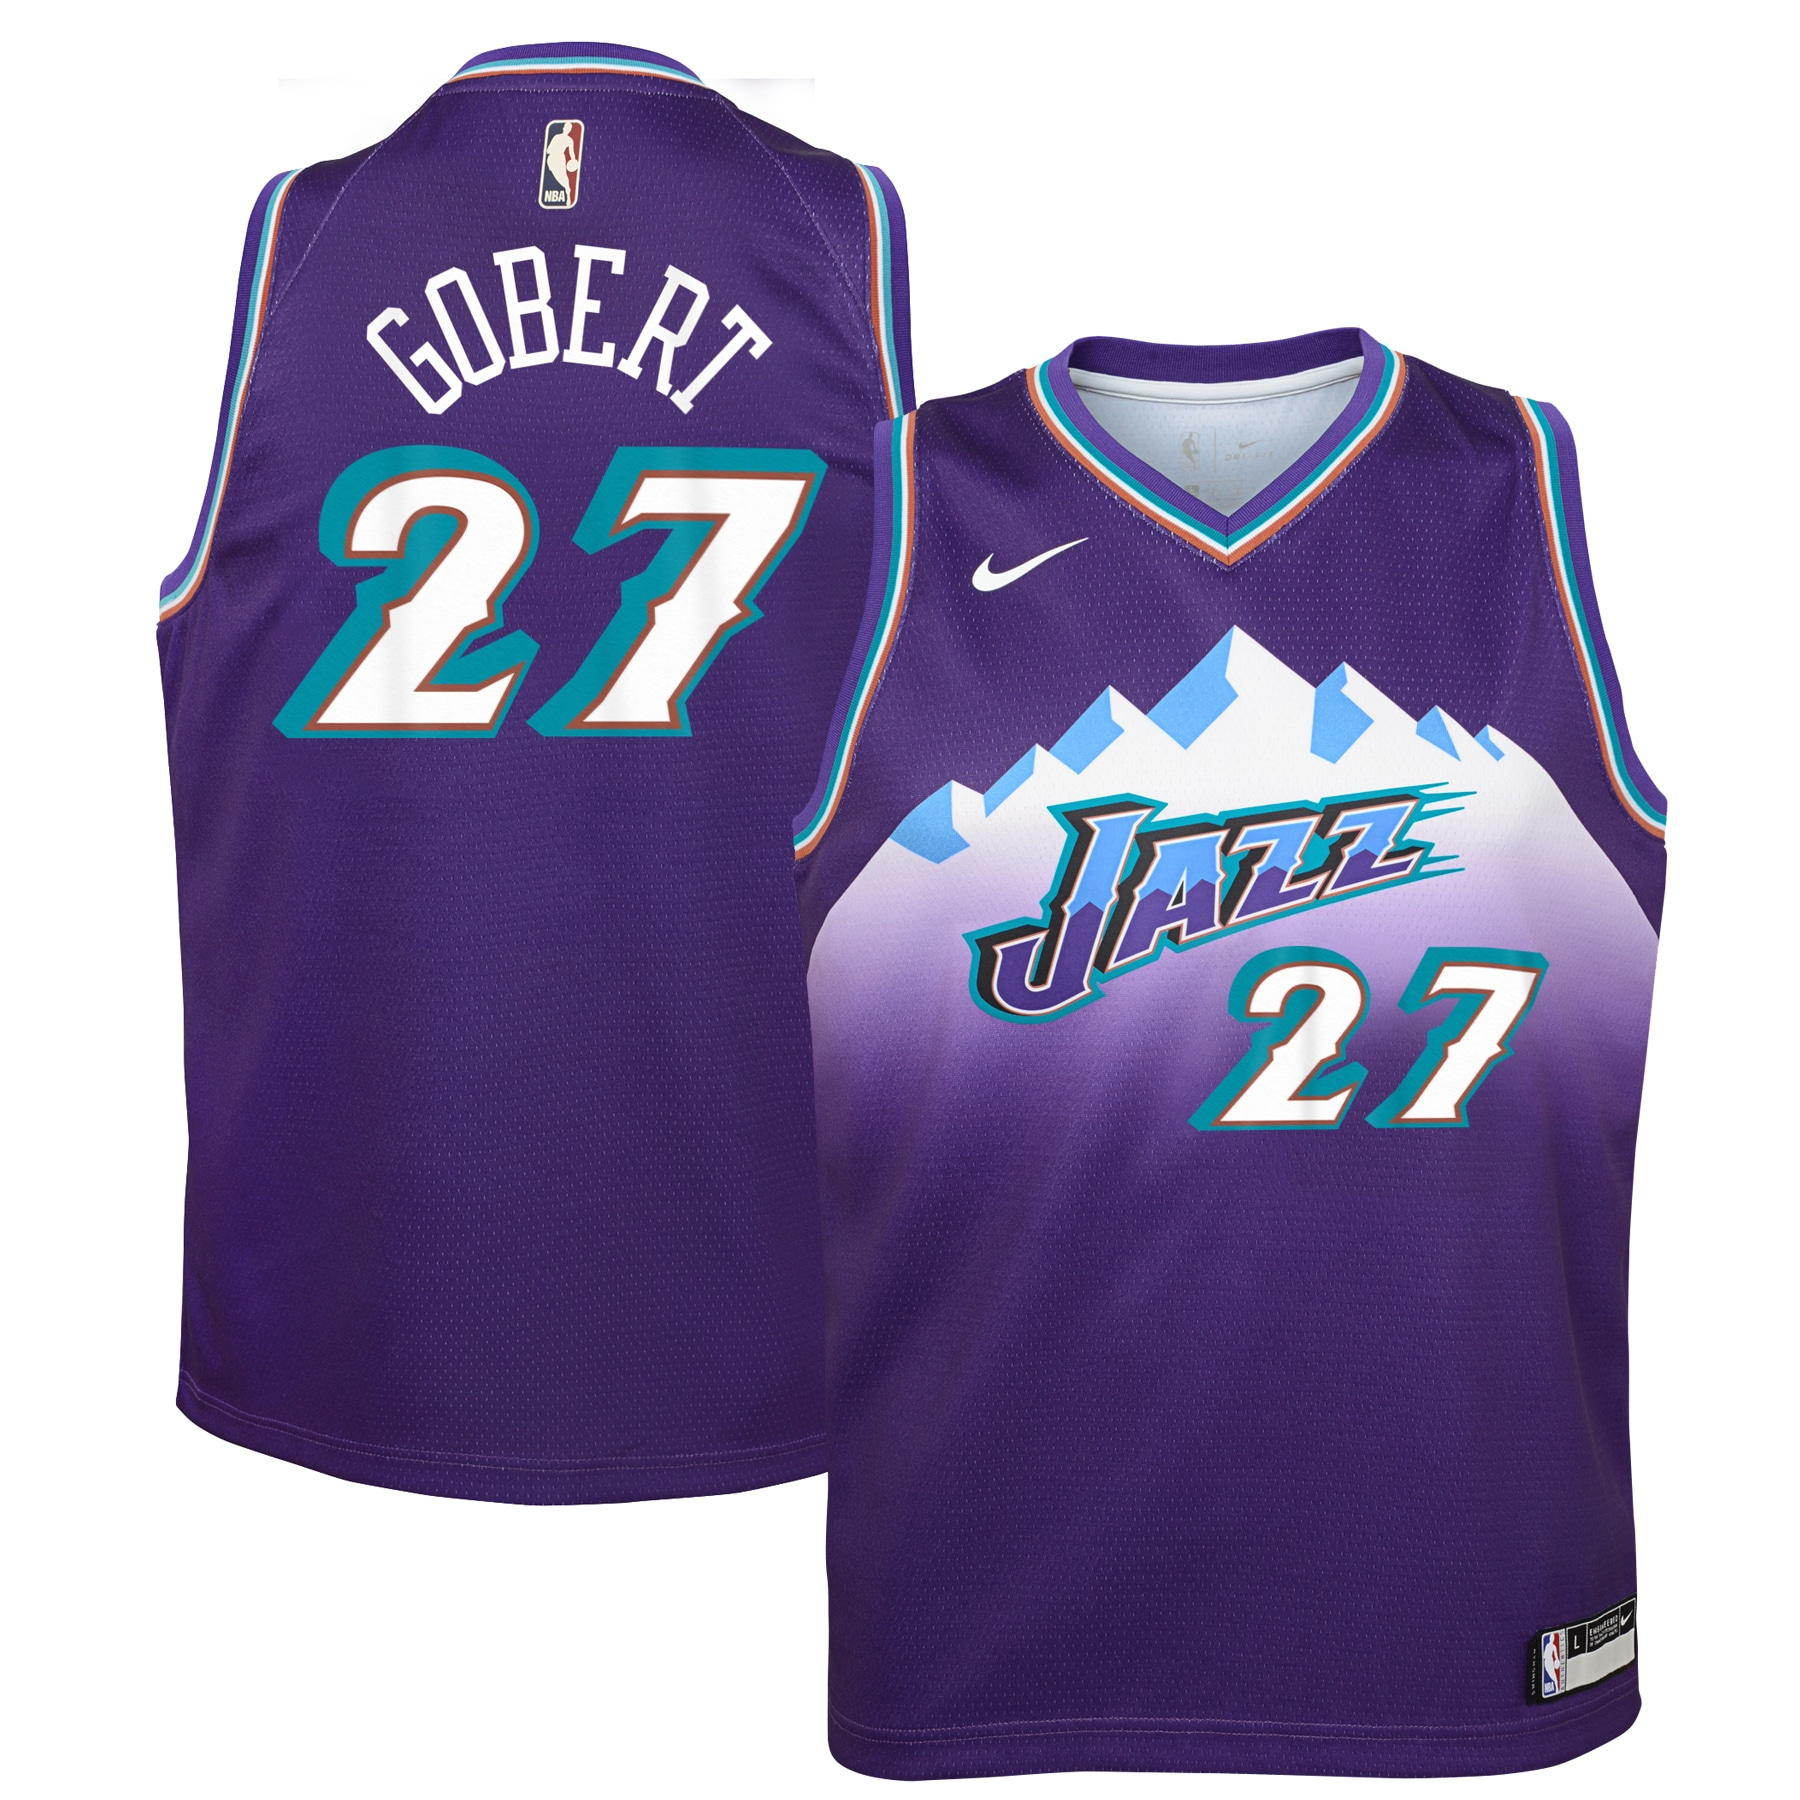 Rudy Gobert Utah Jazz Nike Youth Hardwood Classics Swingman Jersey - Purple